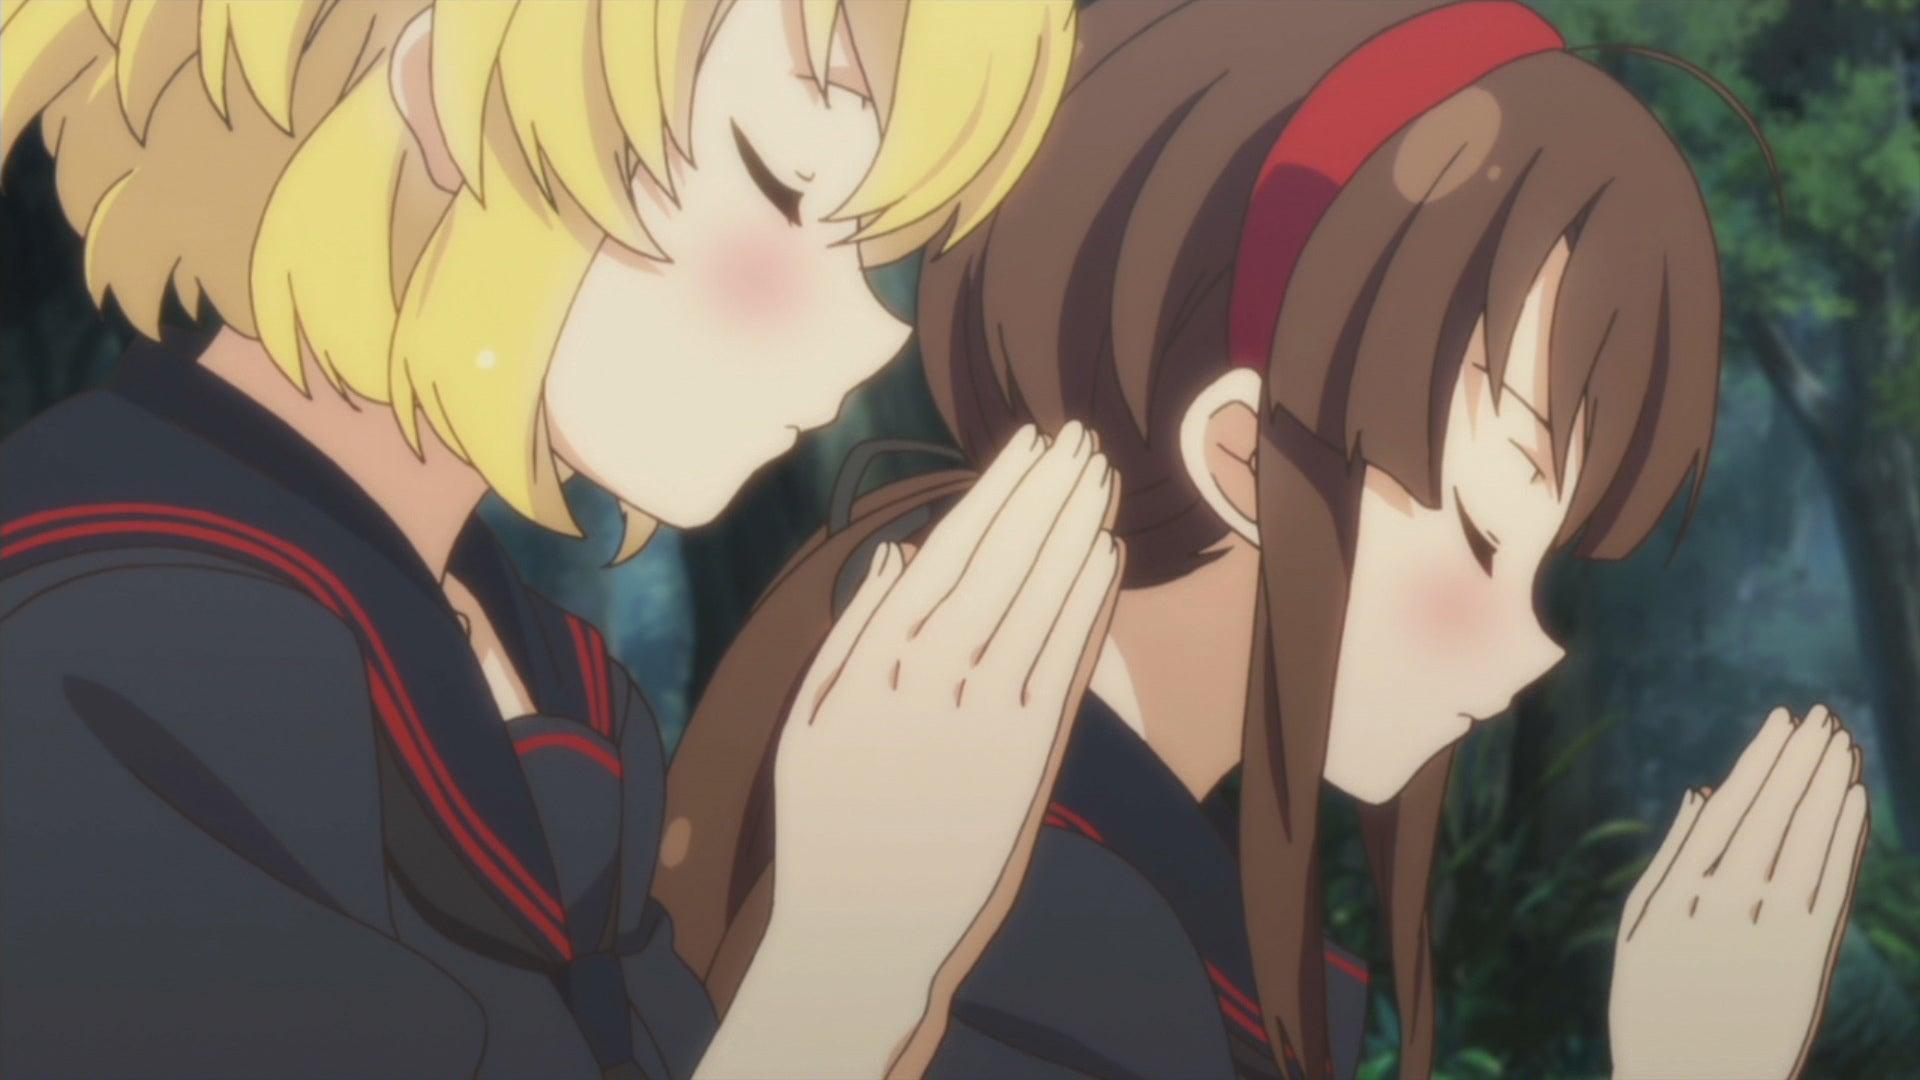 Let's See How Long It Takes Senran Kagura To Make You Uncomfortable